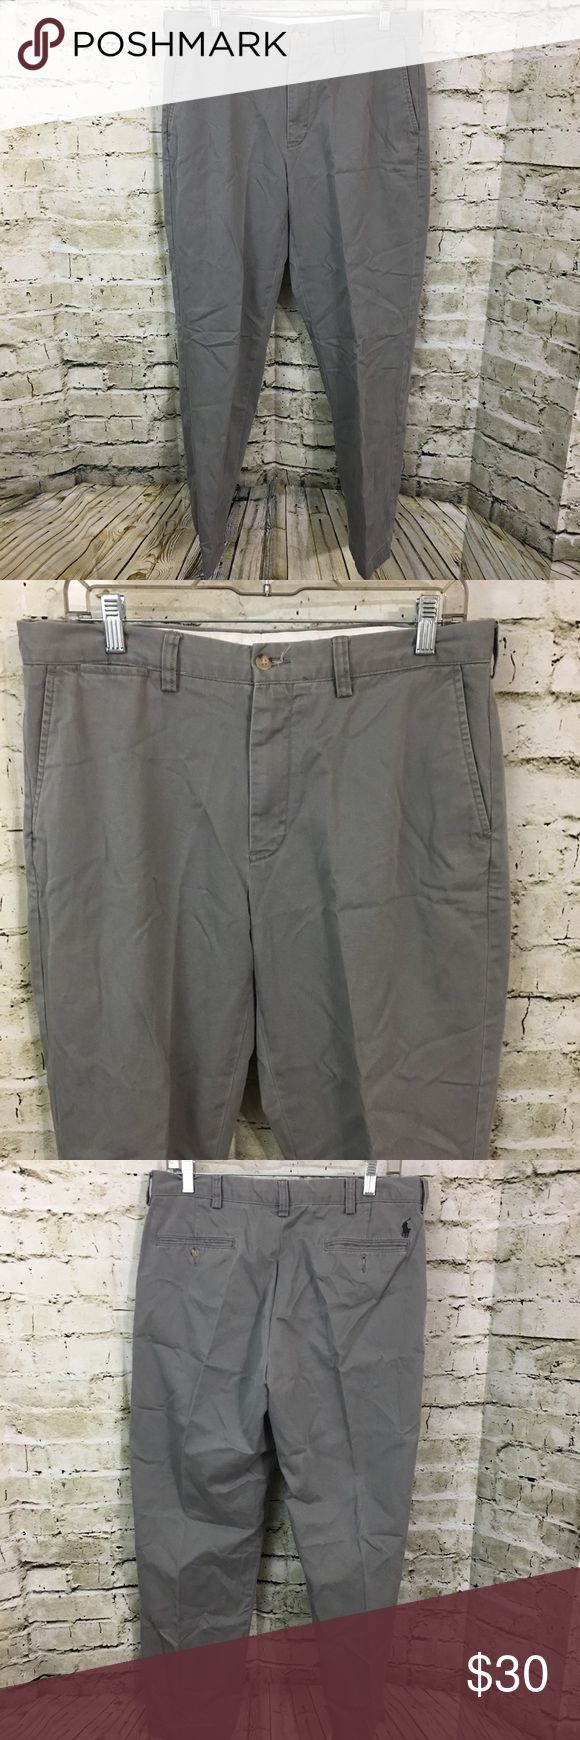 polo ralph lauren pants preston flat front chino by ralph